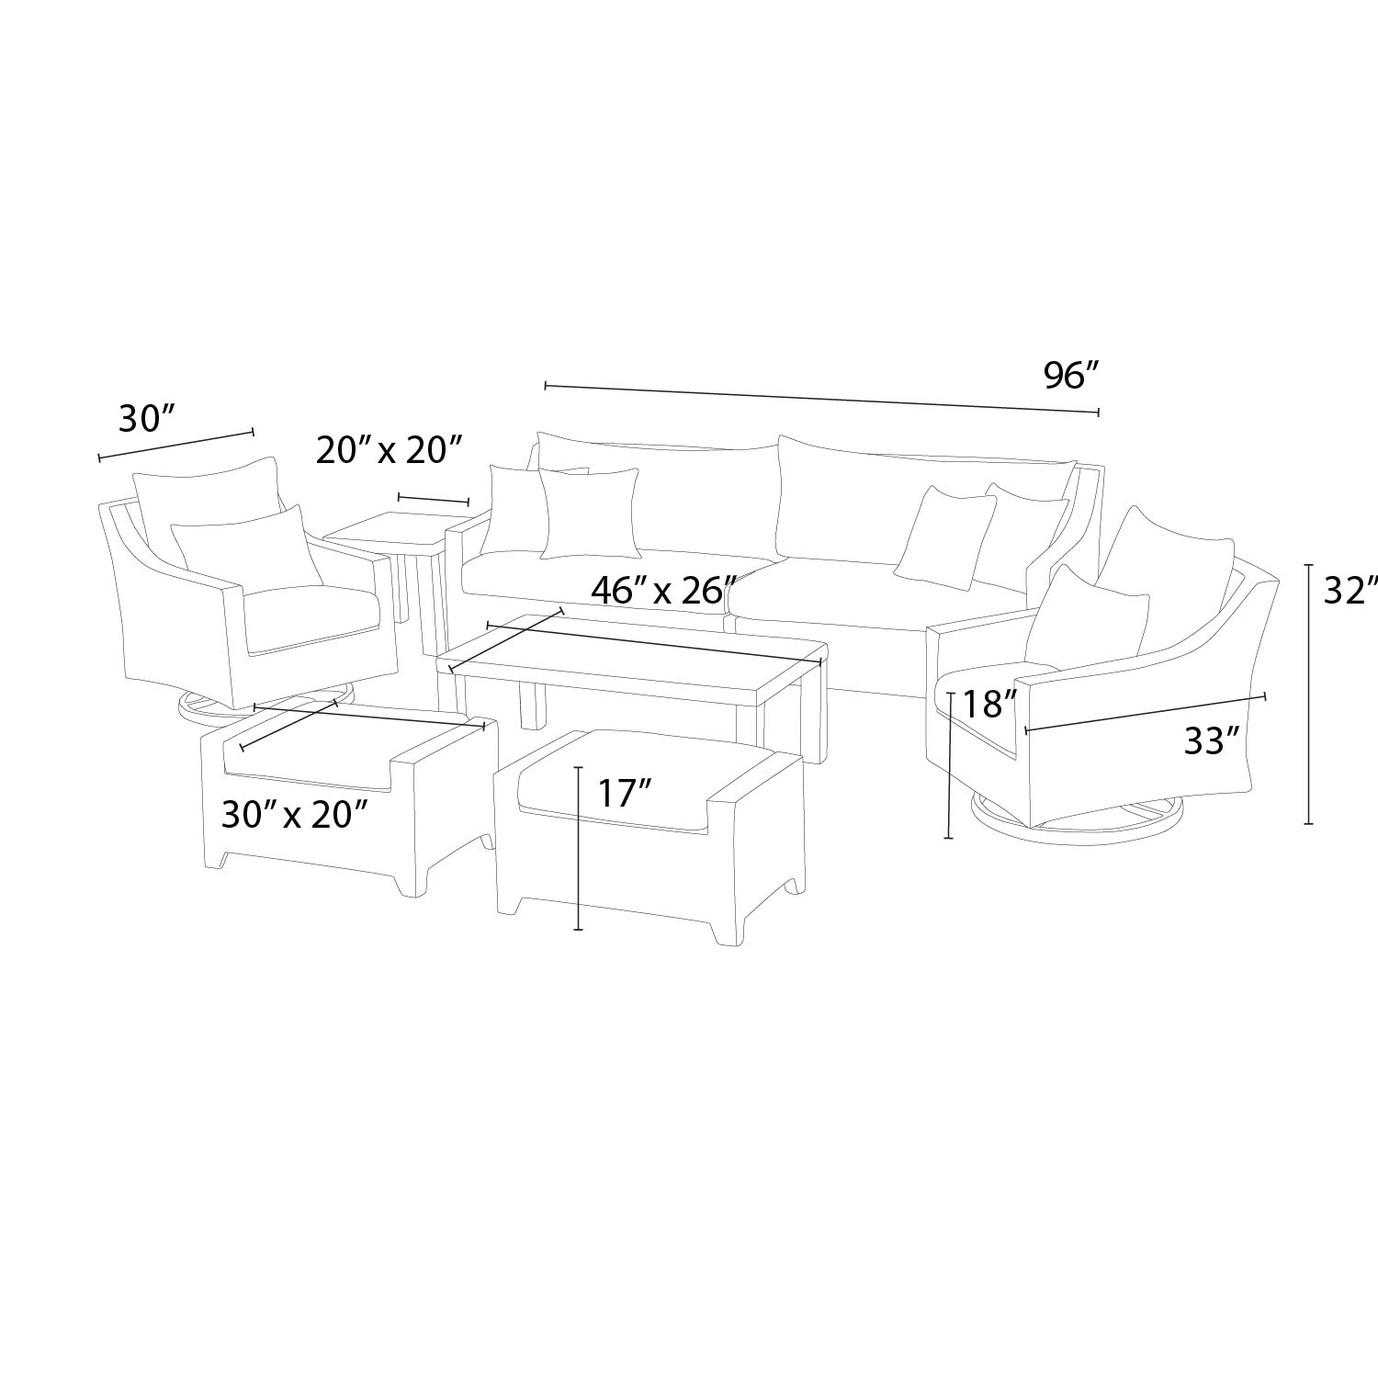 Deco™ Deluxe 8pc Sofa & Club Chair Set - Slate Gray